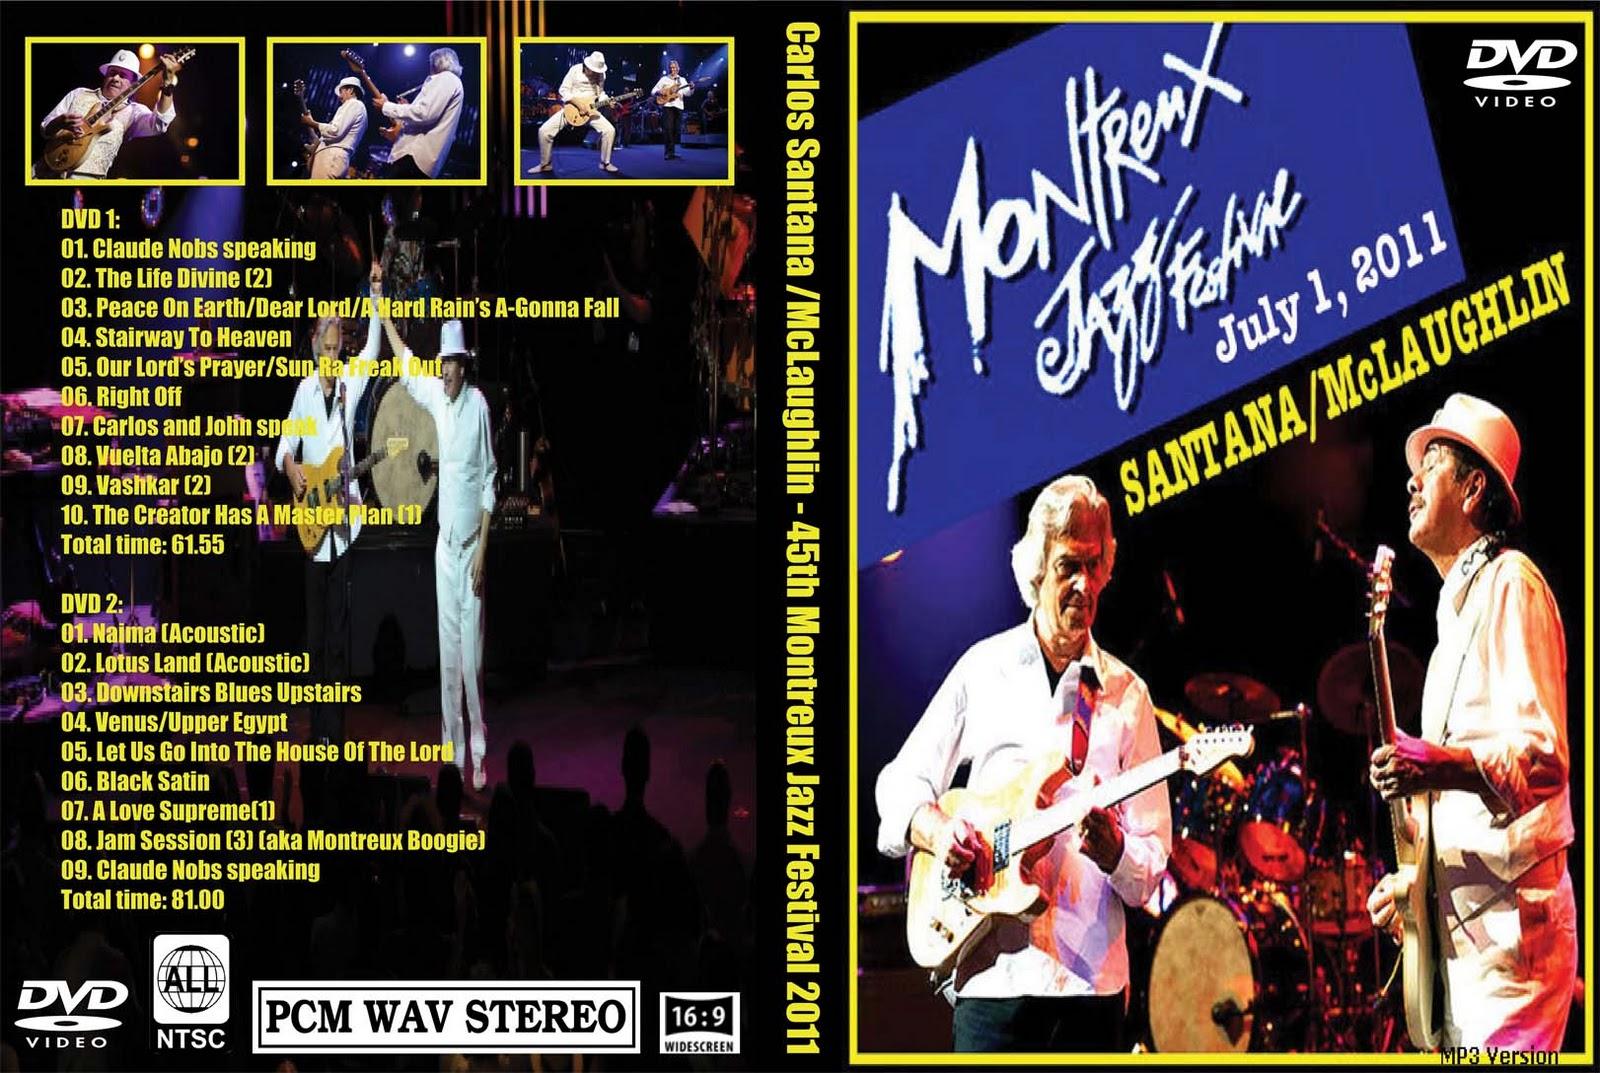 http://3.bp.blogspot.com/-5vGE7rR1kVA/Tox29yOxIjI/AAAAAAAAD7M/88LQF29nQ2I/s1600/DVD+Cover+Low+Quality+-+Carlos+Santana+-+John+McLaughlin+Montreux+1+July+2011.jpg